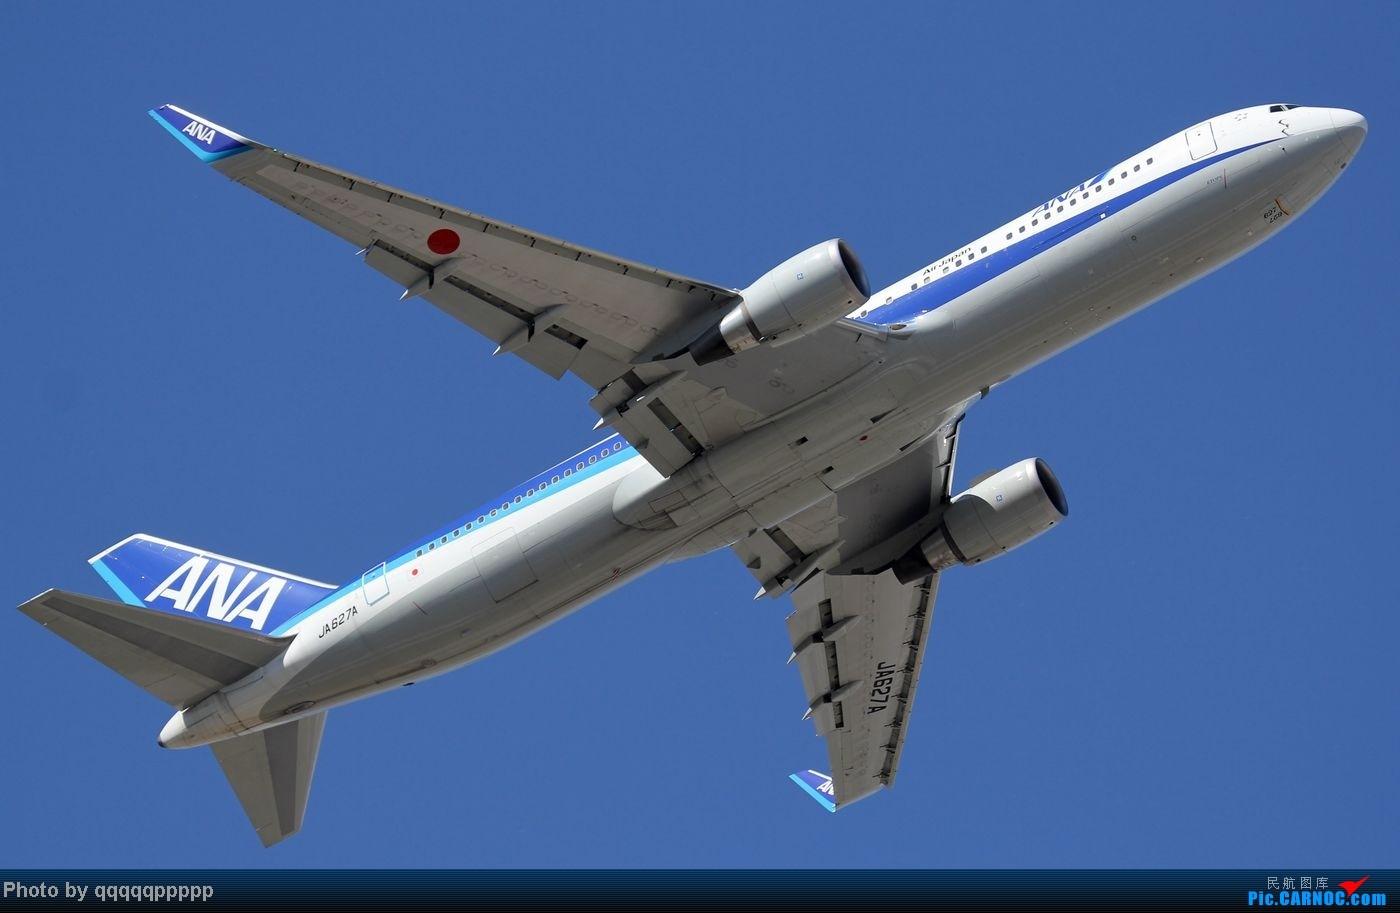 Re:[原创]五一小假期~北京迎来春暖花开的好天气。岂能错过这个拍机的好机会~ B767-300ER JA627A 中国北京首都机场